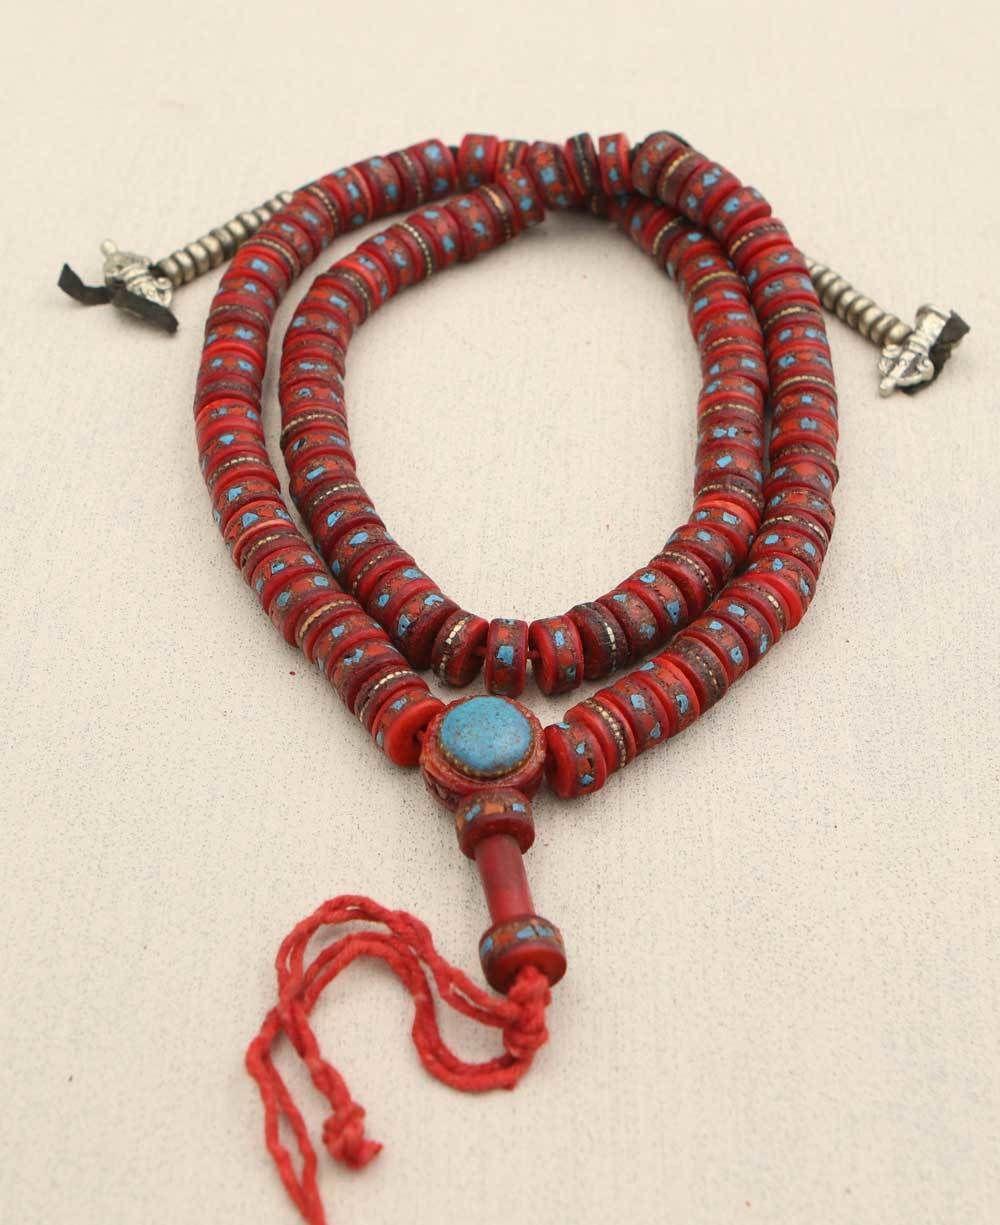 10 handmade Tibetan prayer beads nepal brass beads with turquoise coral inlay